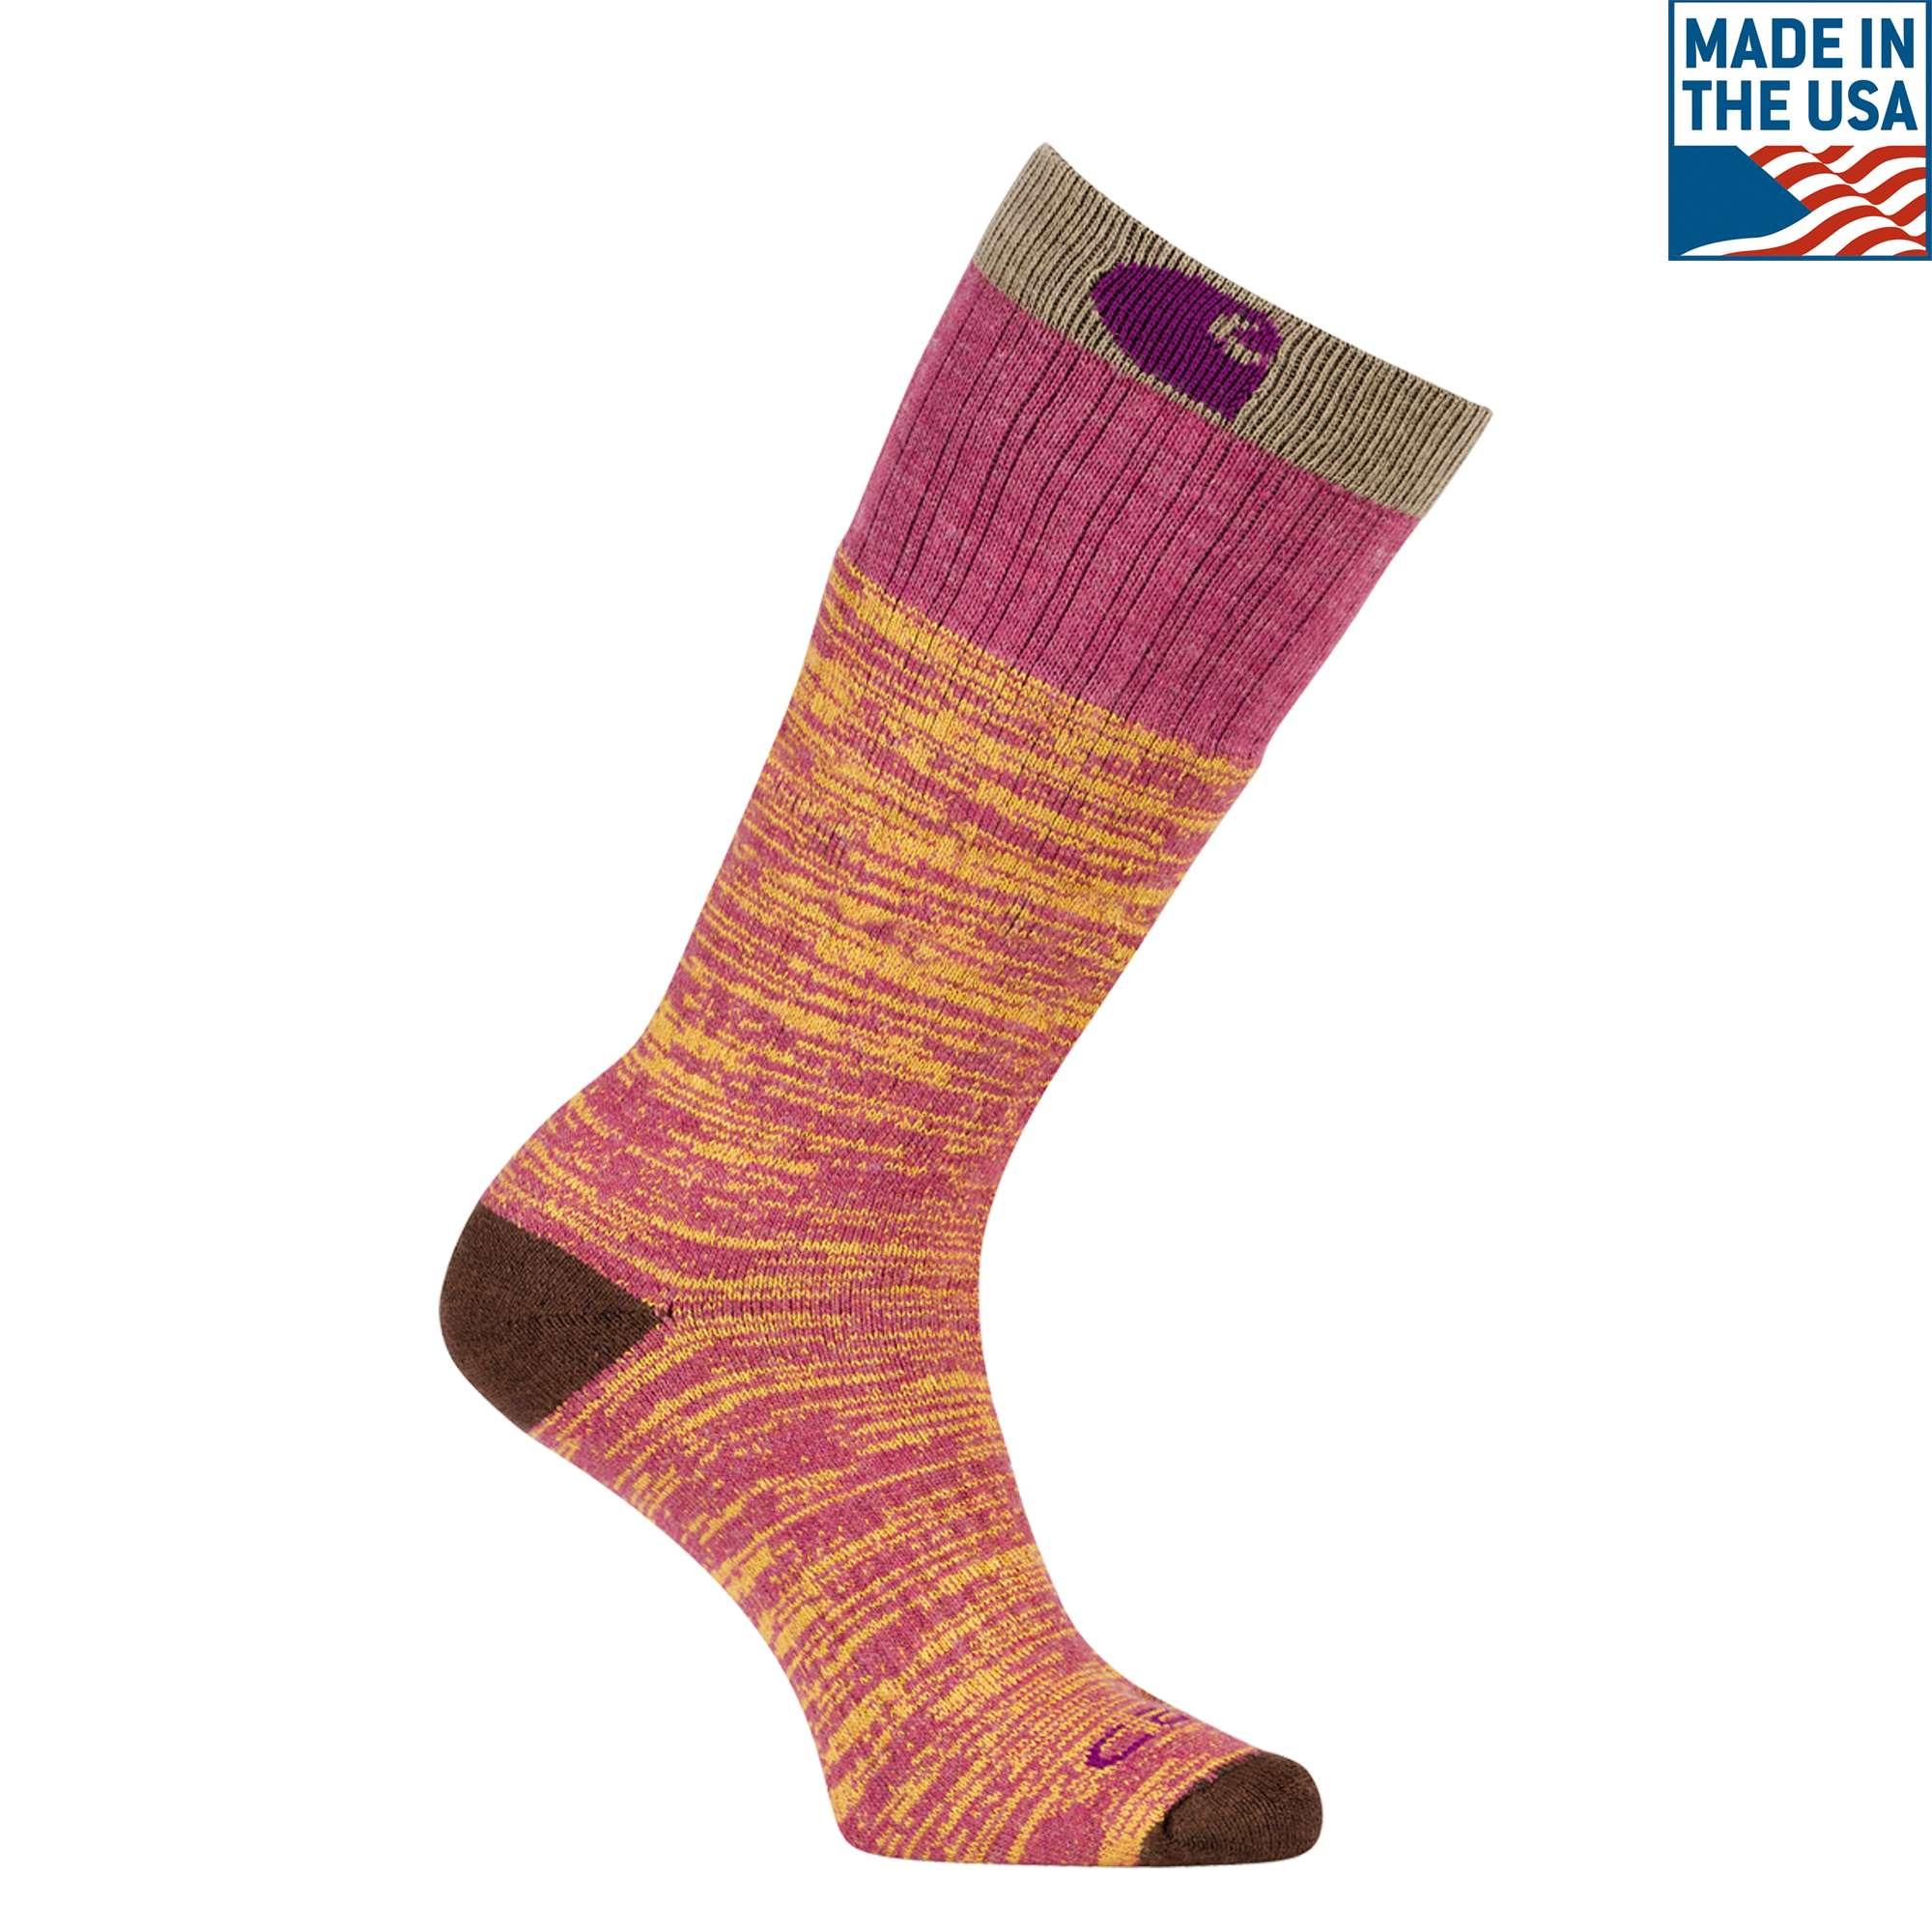 Carhartt Outdoor Knee High Sock